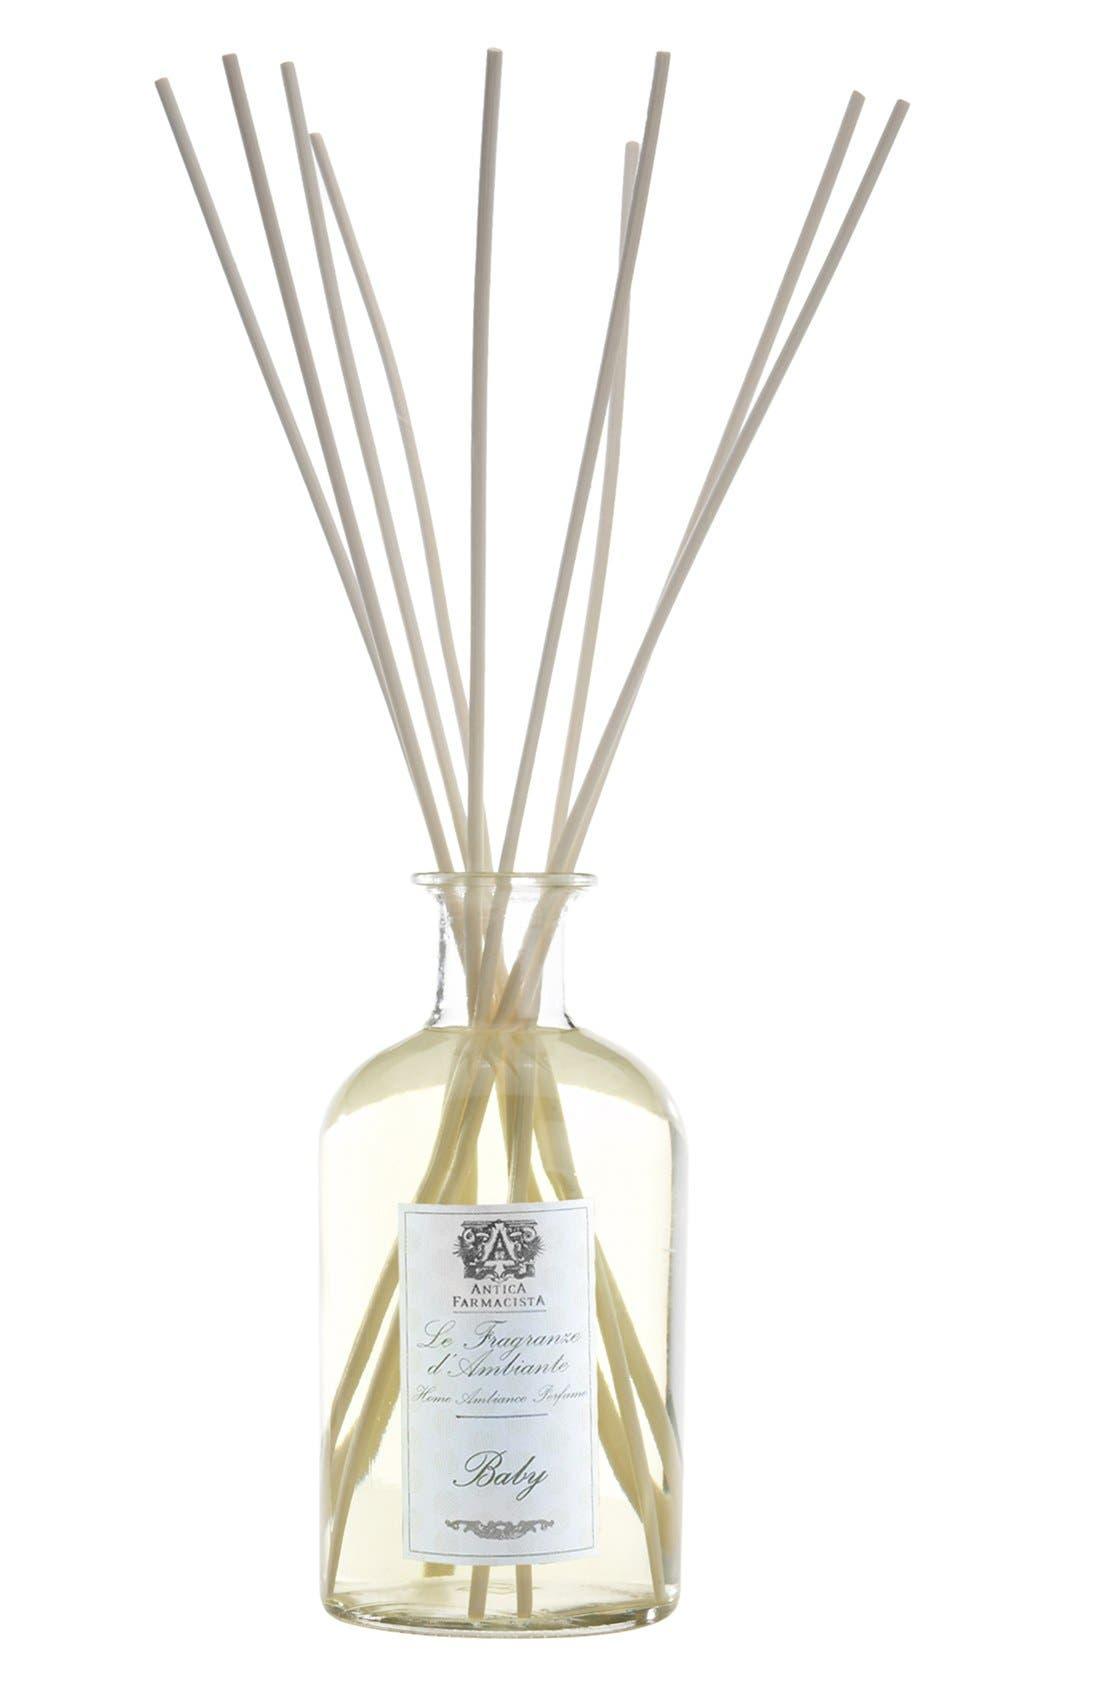 Antica Farmacista Baby Home Ambiance Perfume